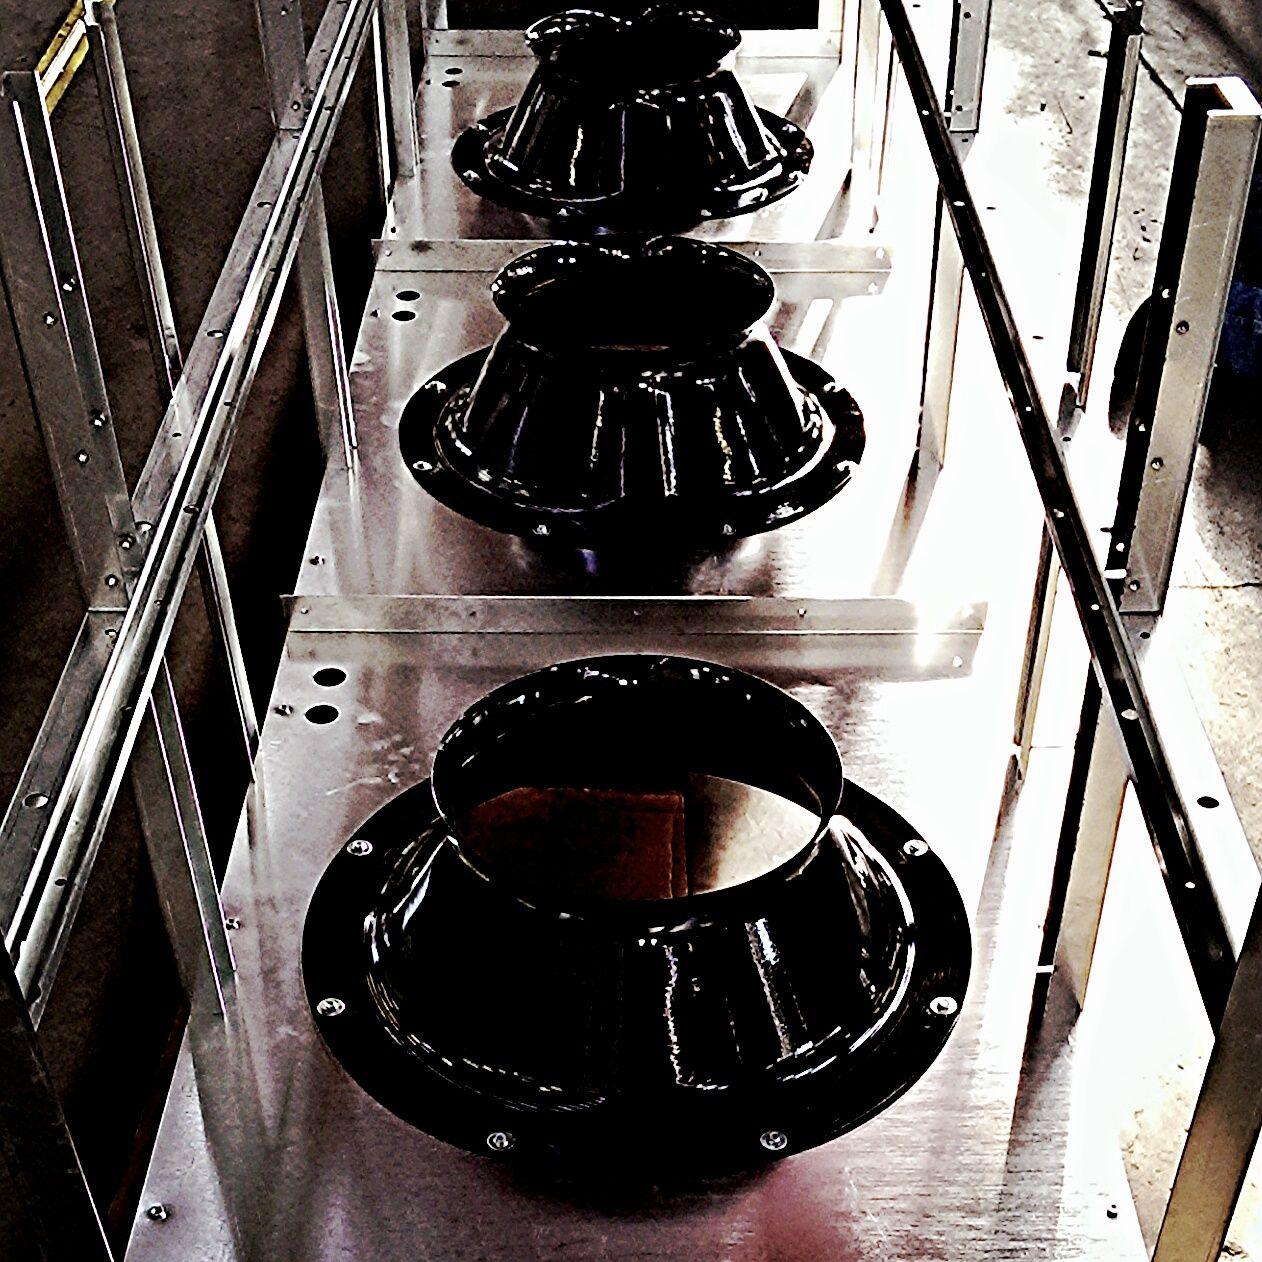 Fan cones for a highefficiency custom data center air